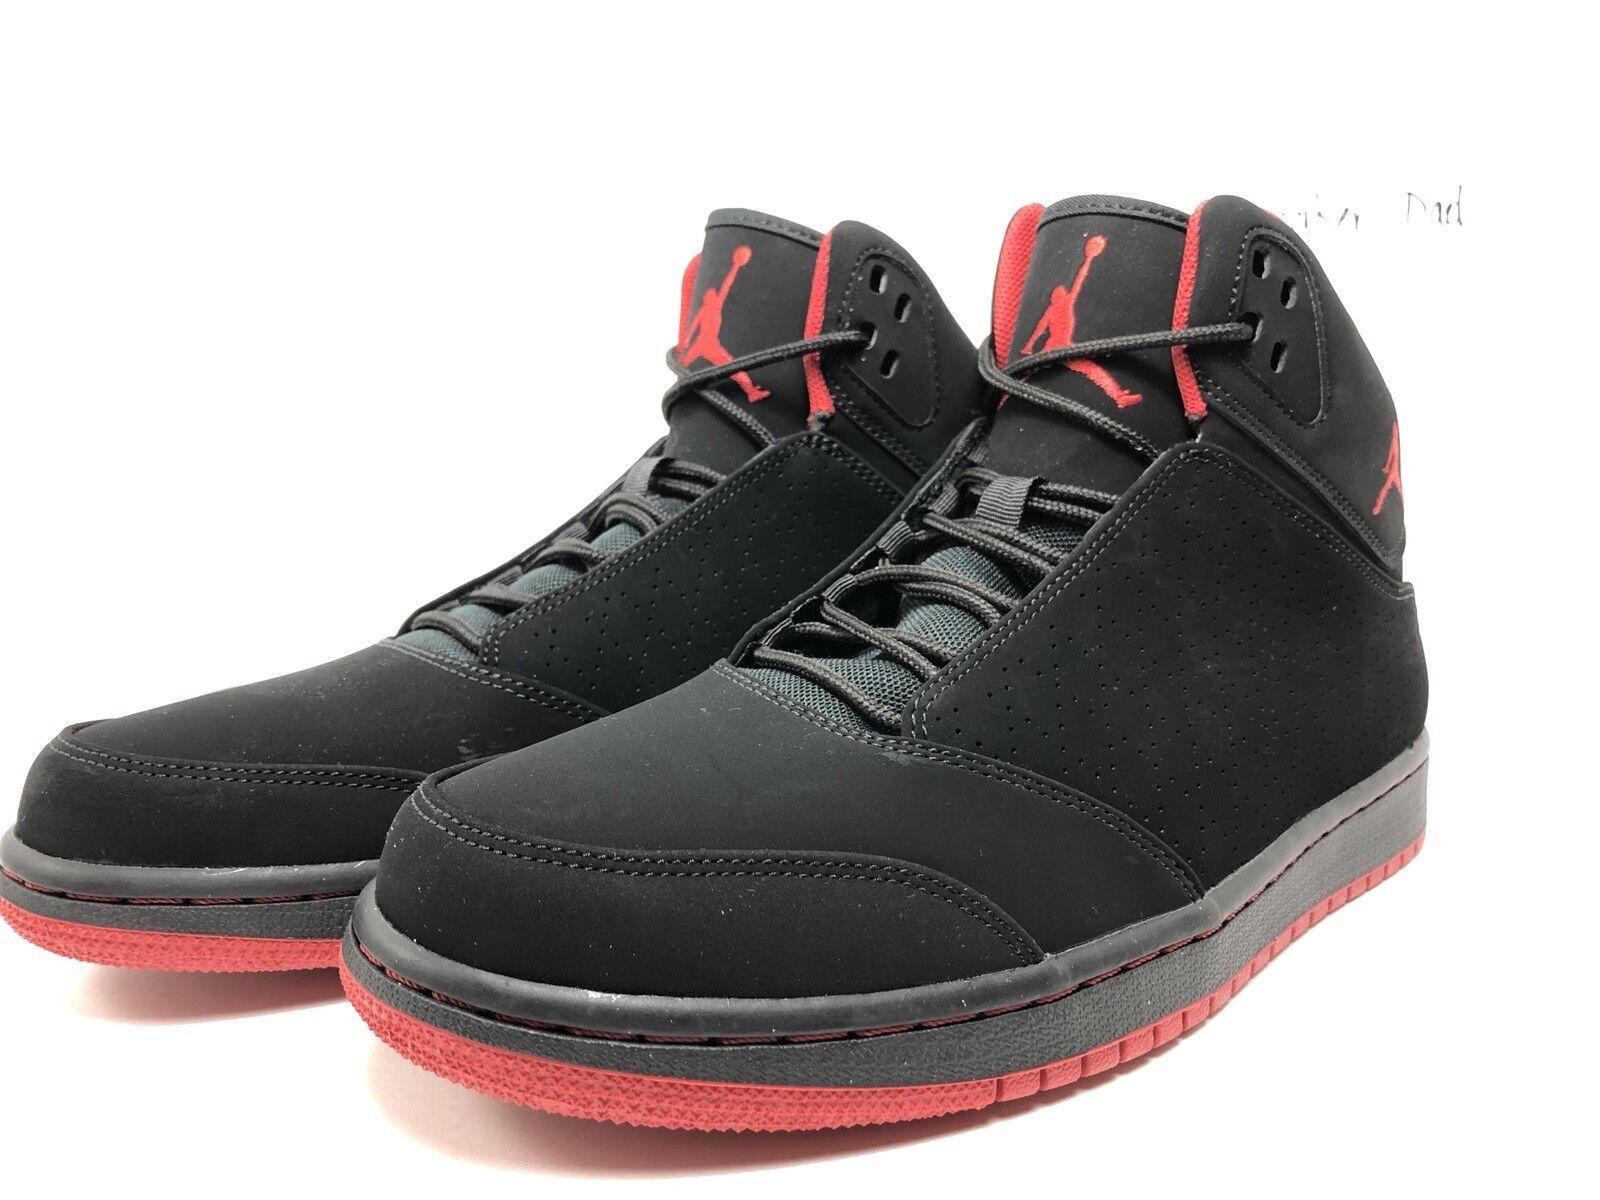 New Men's Shoes Nike Air Jordan 1 Flight 5 Black Gym Red 881433 002 Size 10